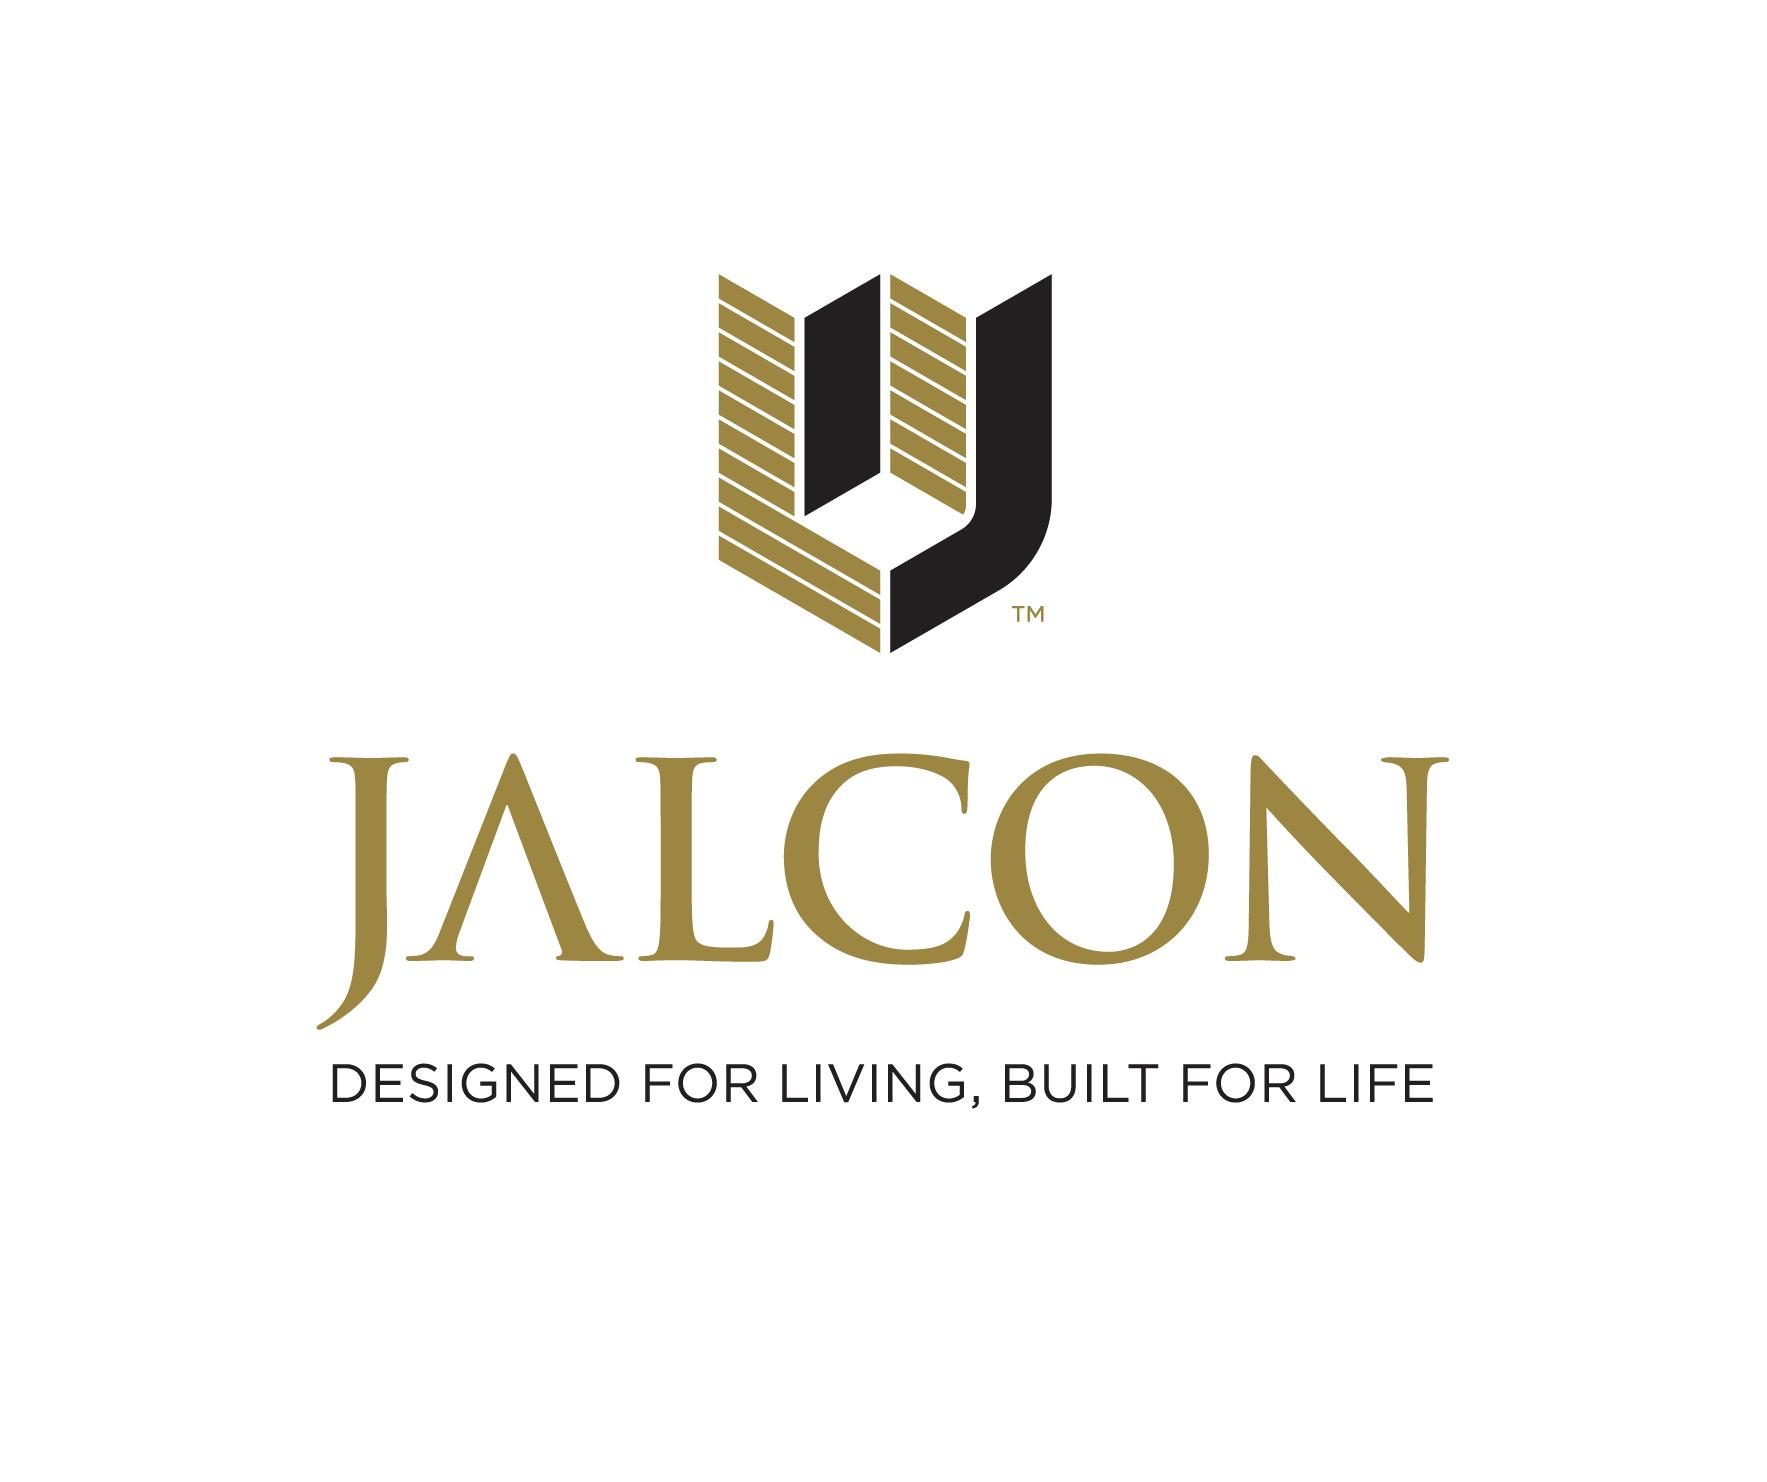 Jalcon-corebrand-FA_vert-col-pos.jpg